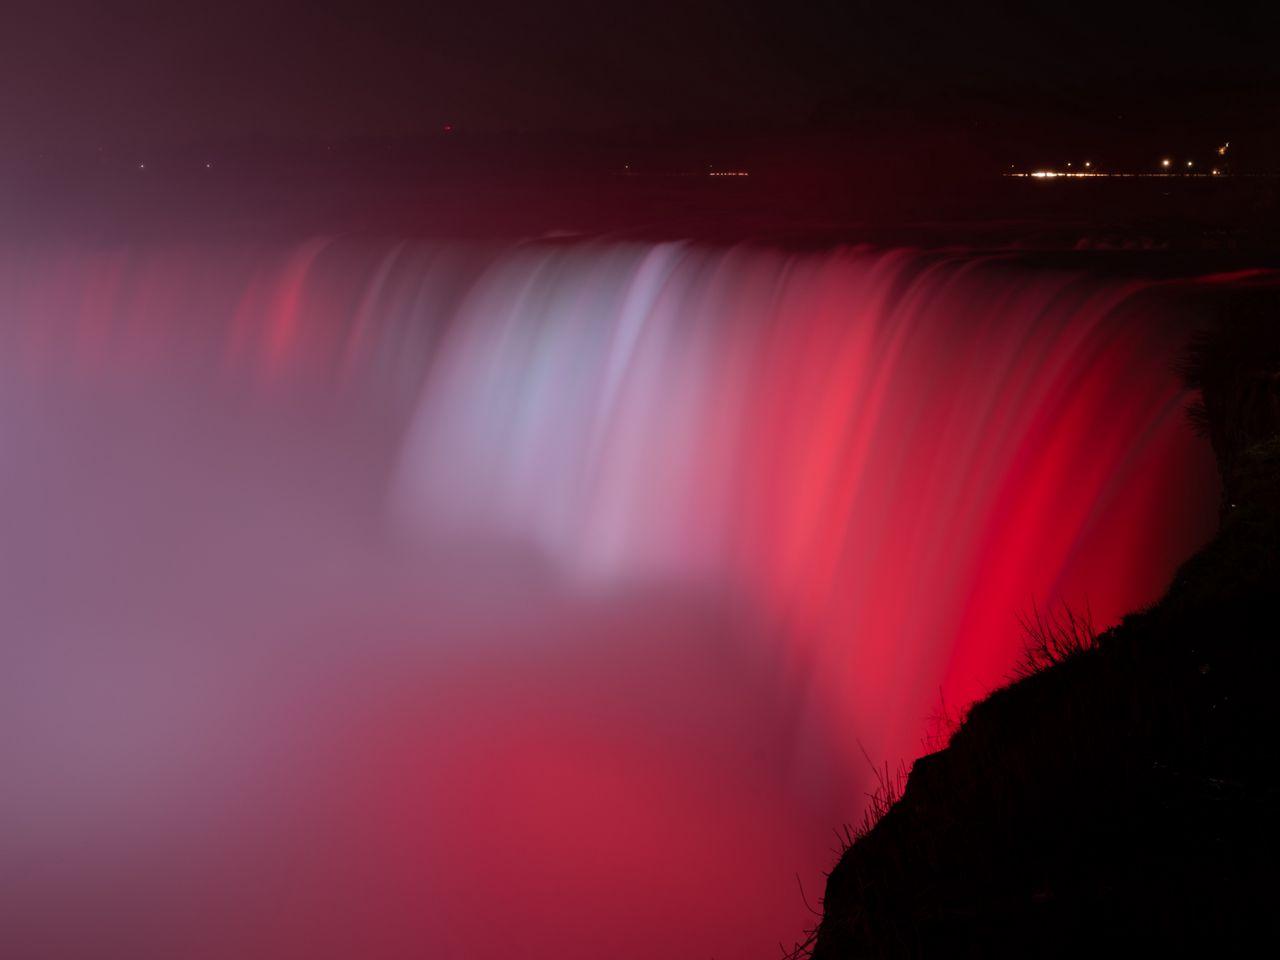 1280x960 Wallpaper waterfall, fog, backlight, red, dark